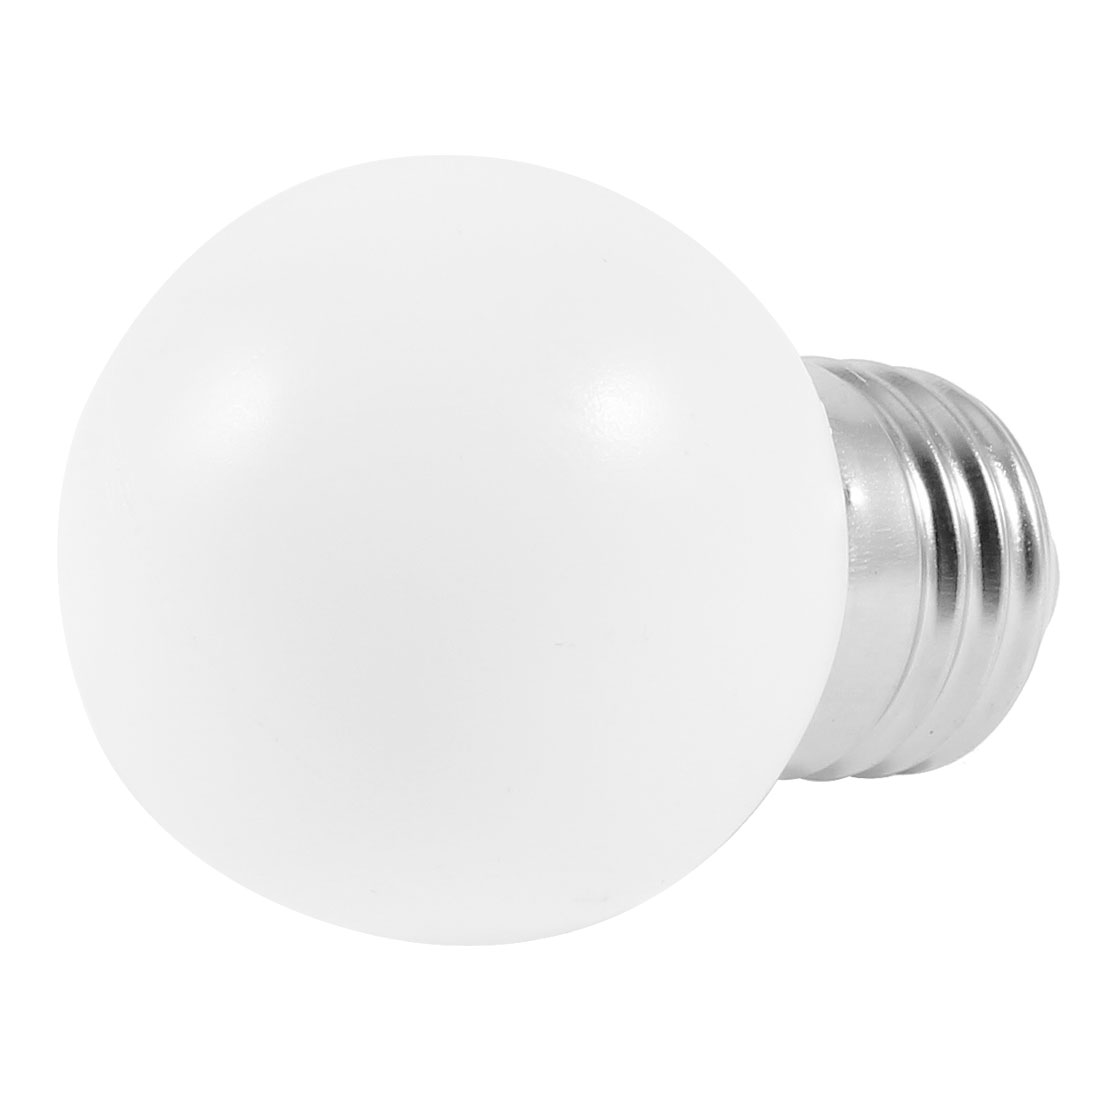 AC 160-250V 1W E27 Socket White LED Bulb Energy Saving Lamp